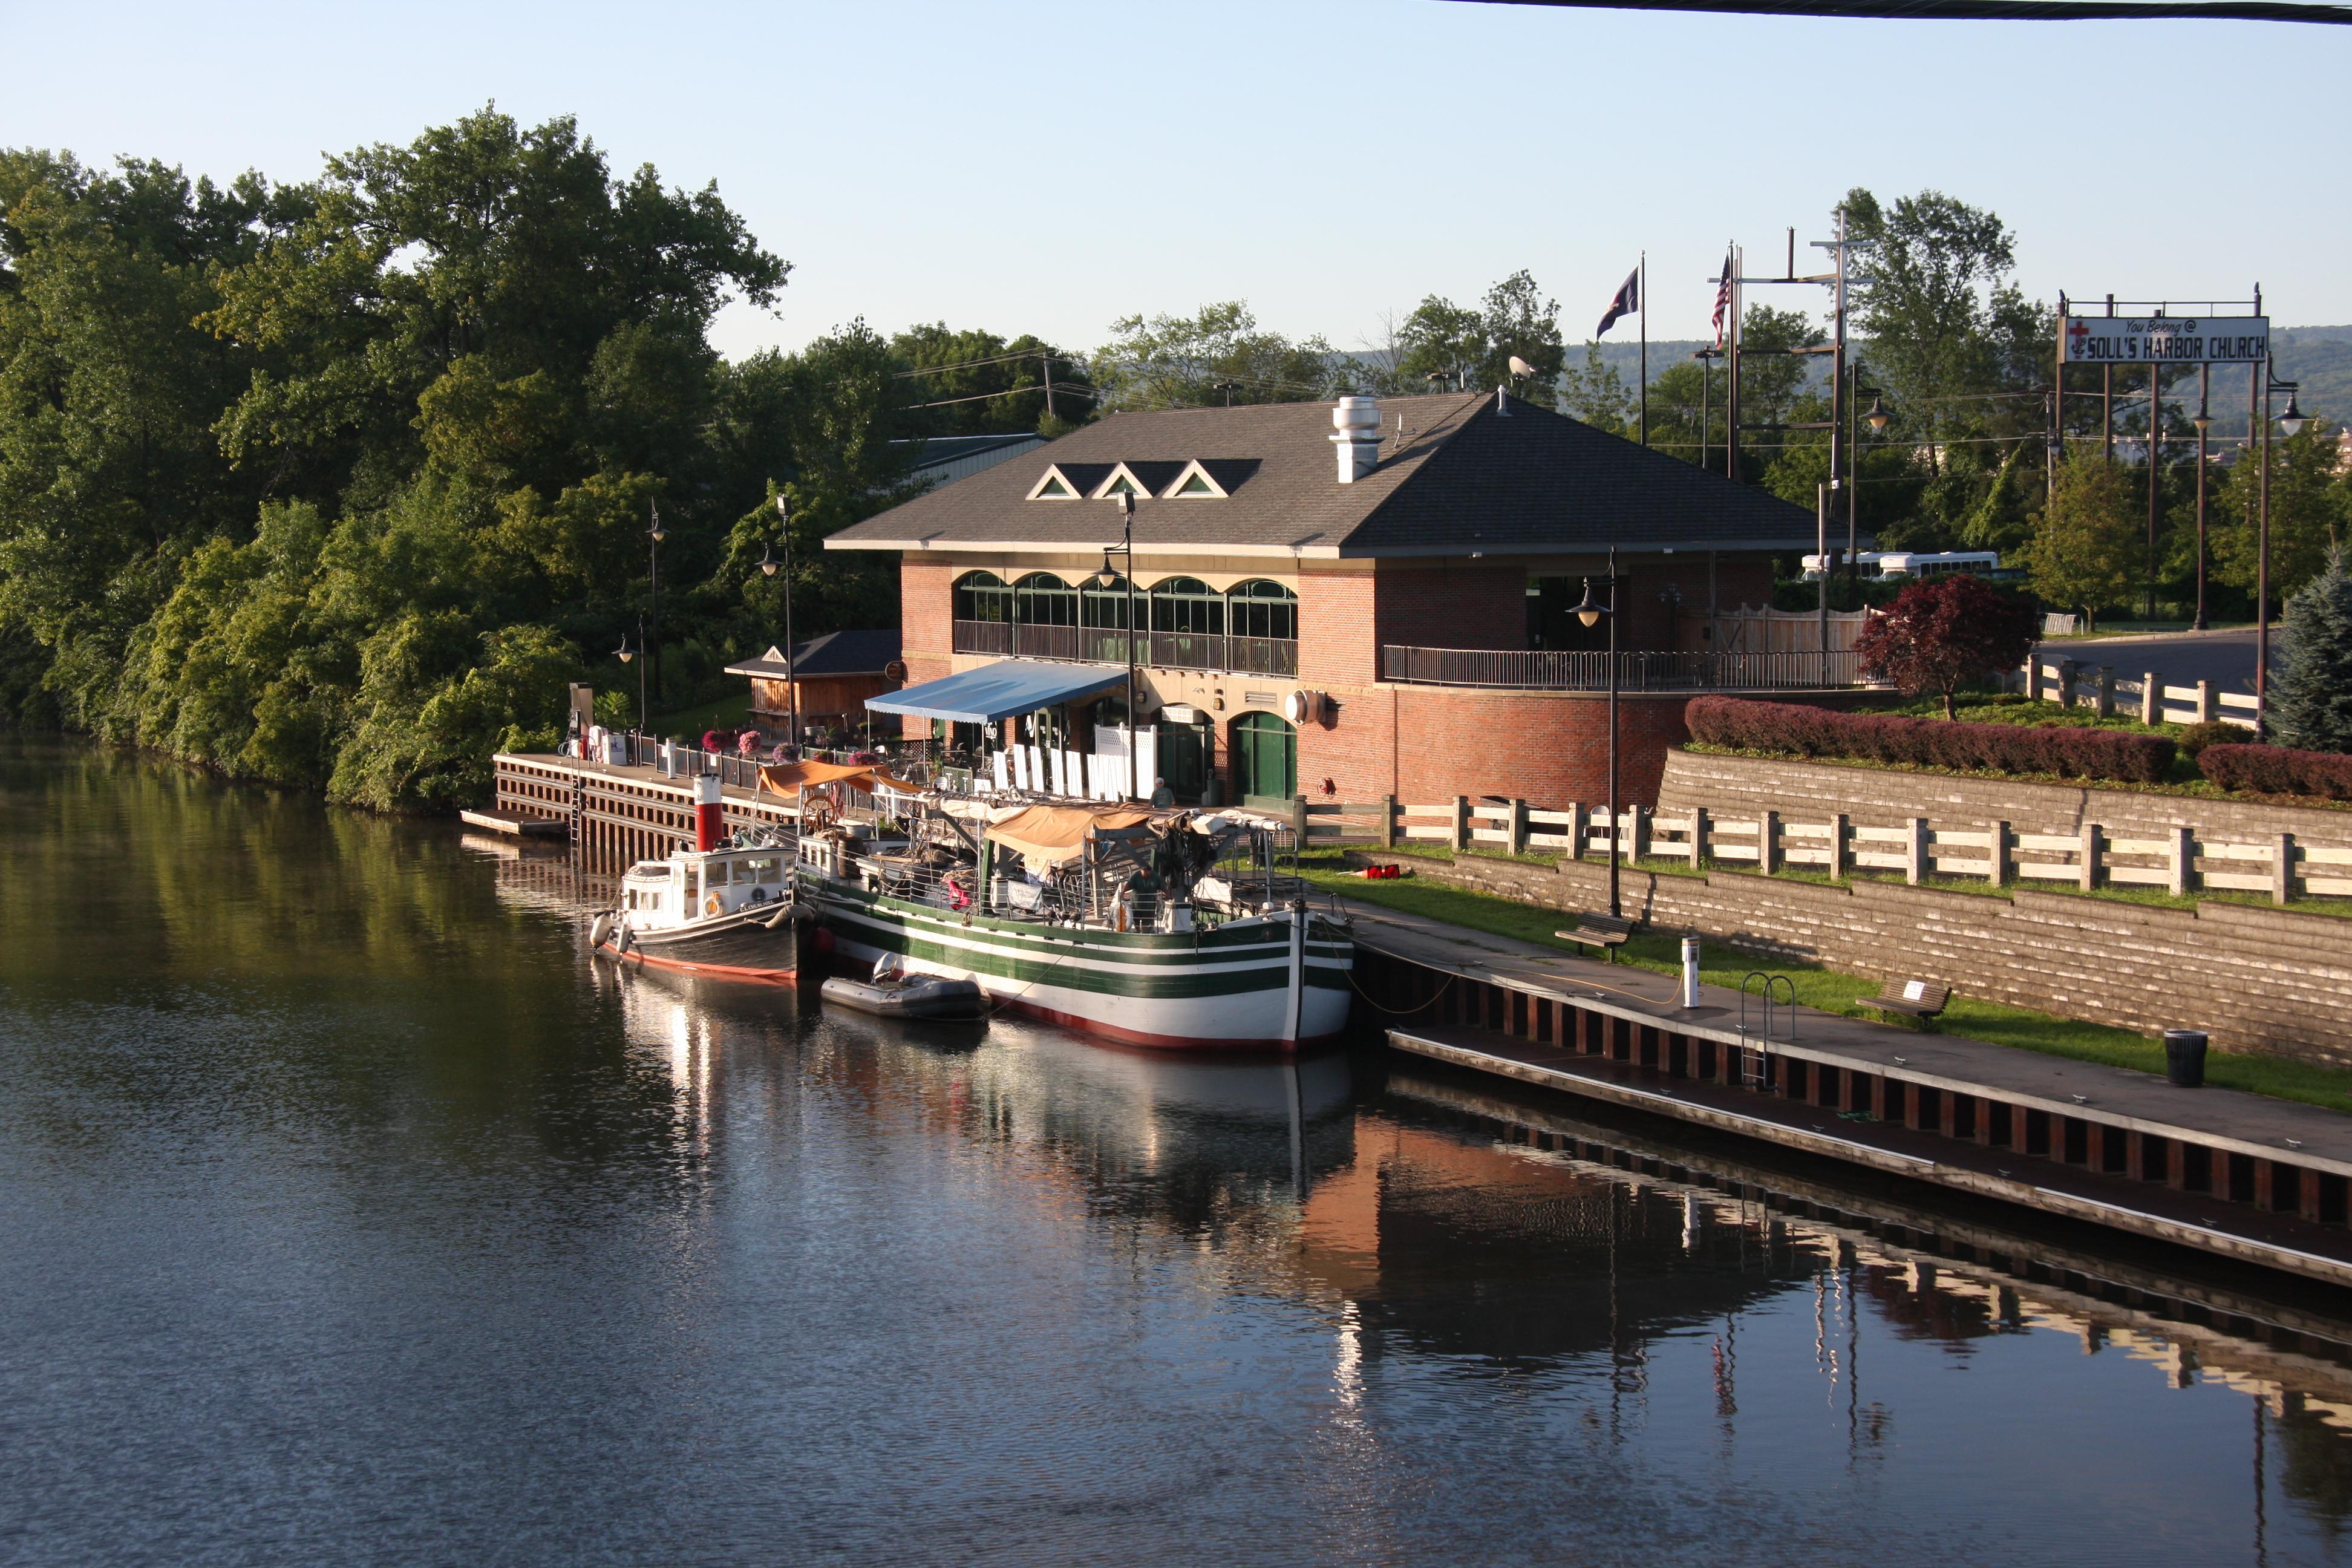 Docked in Utica